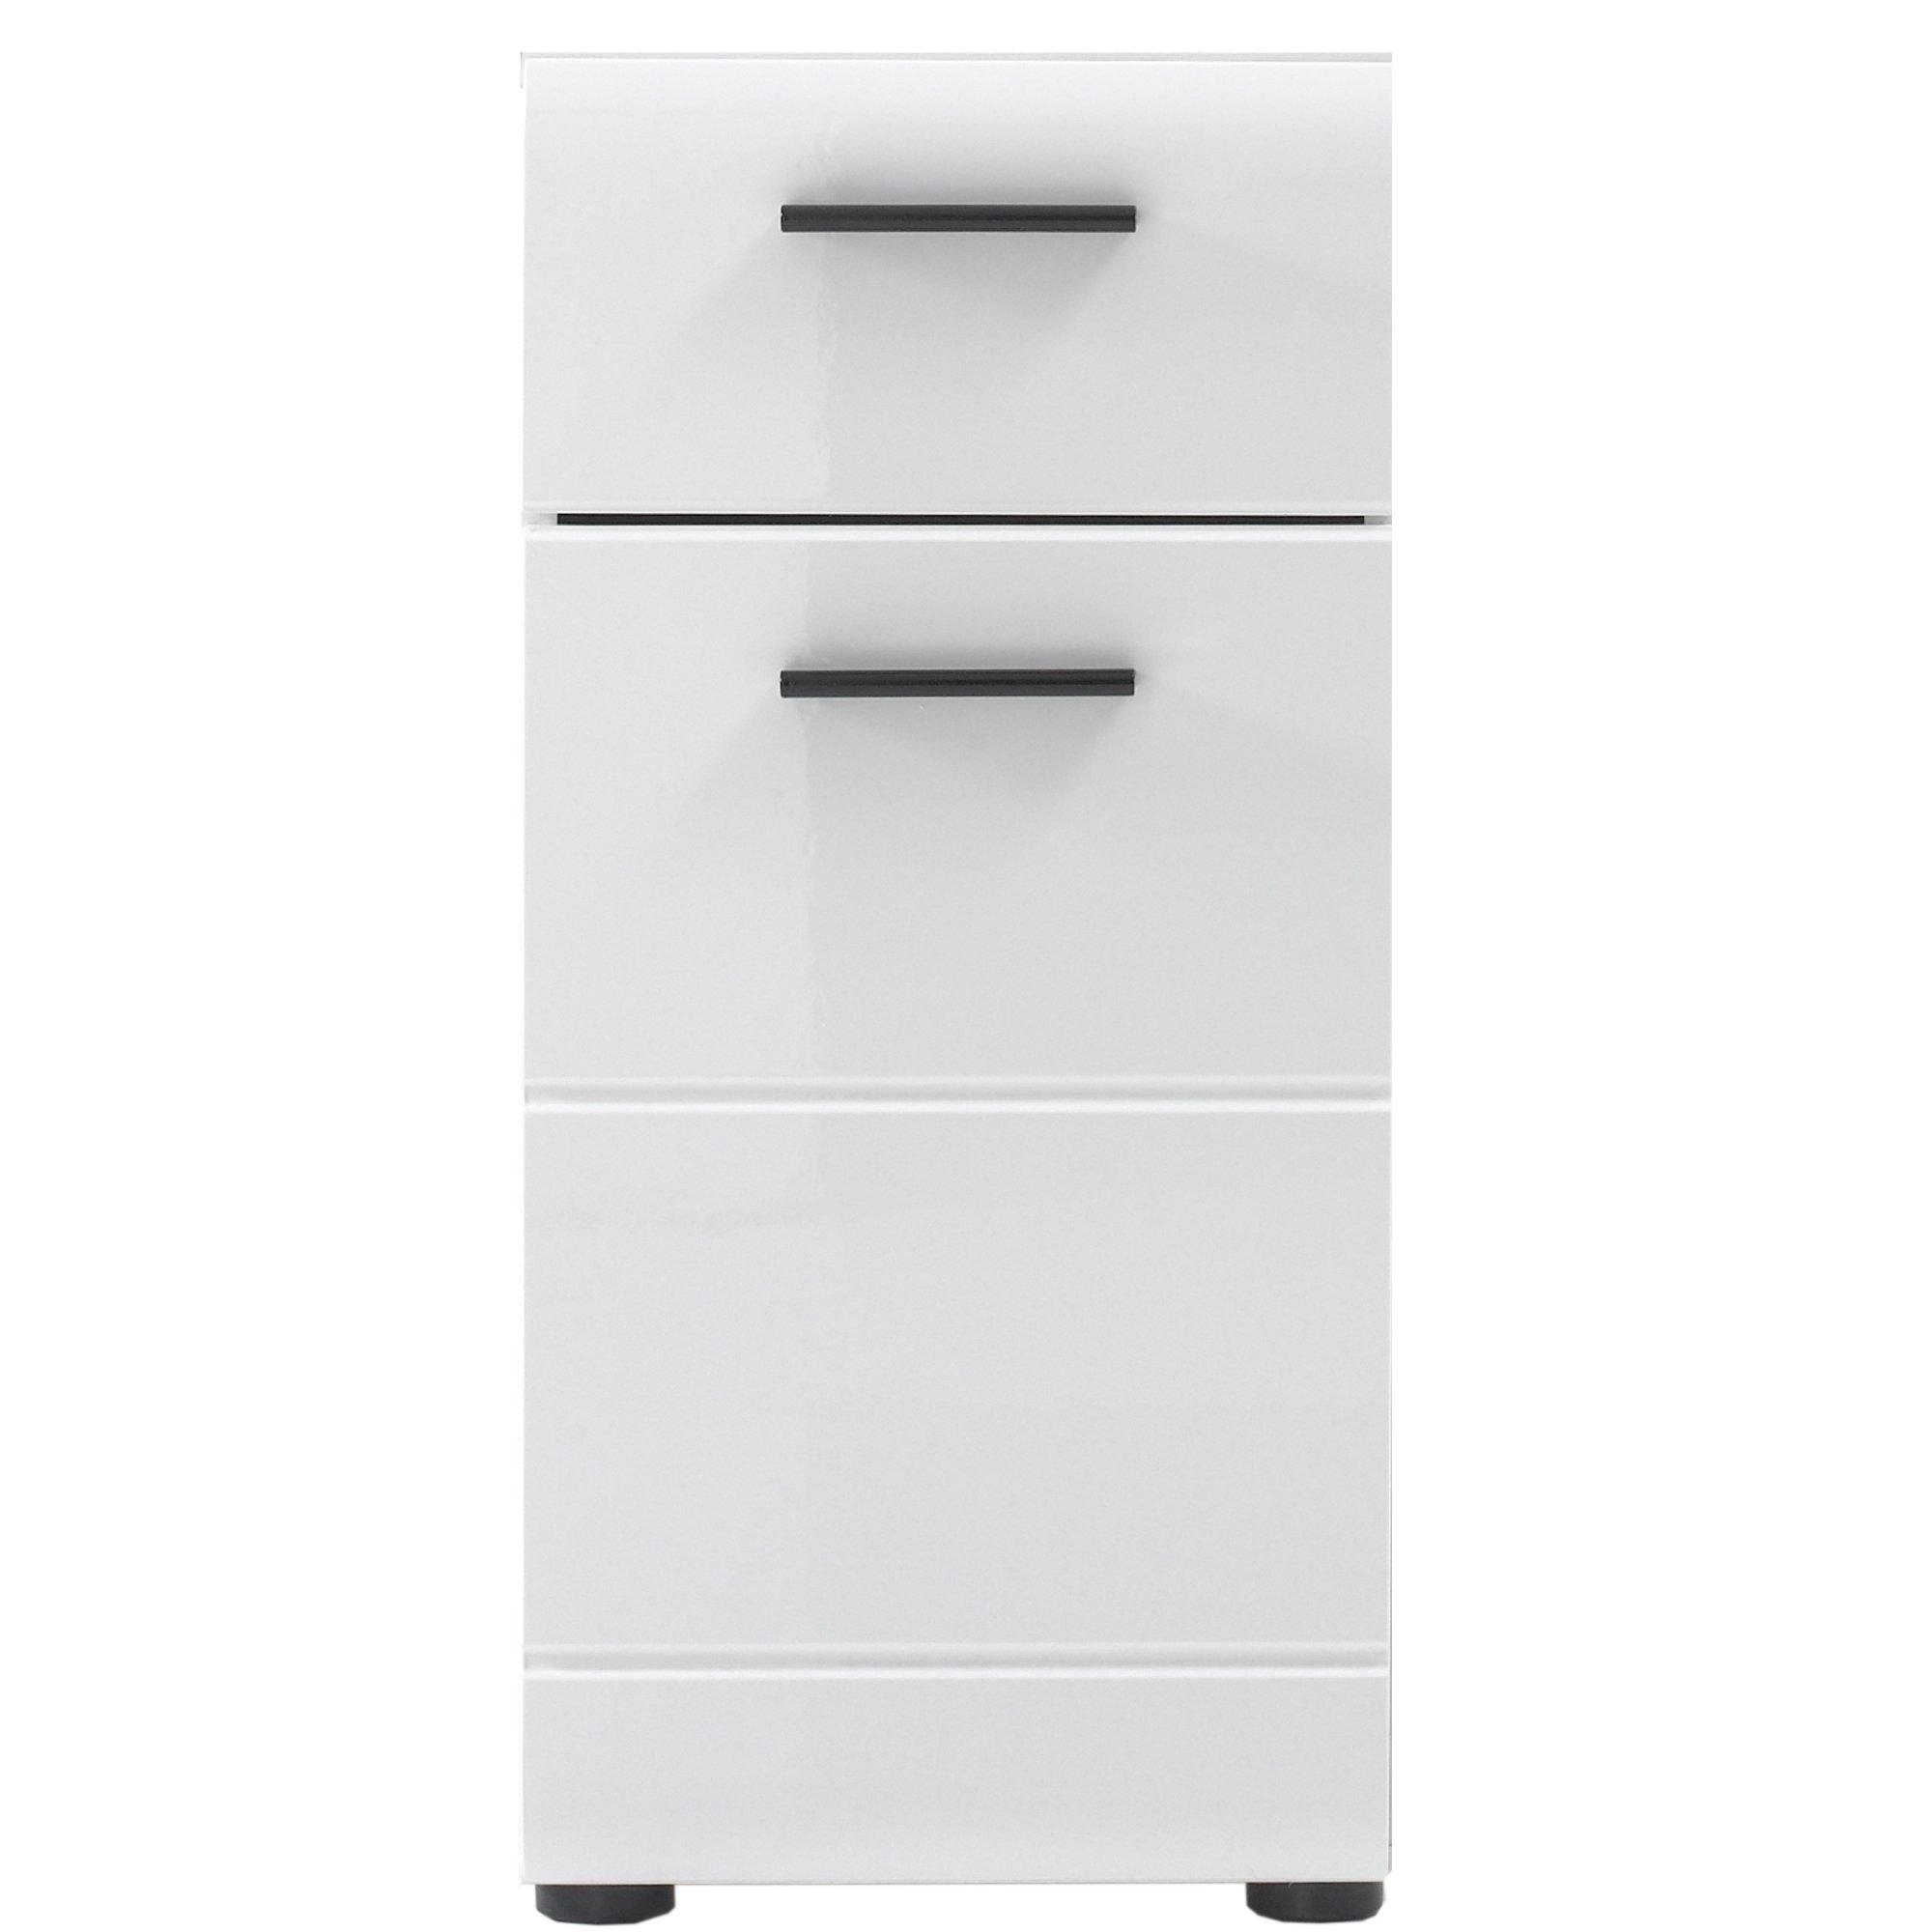 Furnline 1116 802 01 skin high gloss bathroom side cabinet - High gloss bathroom cabinets white ...